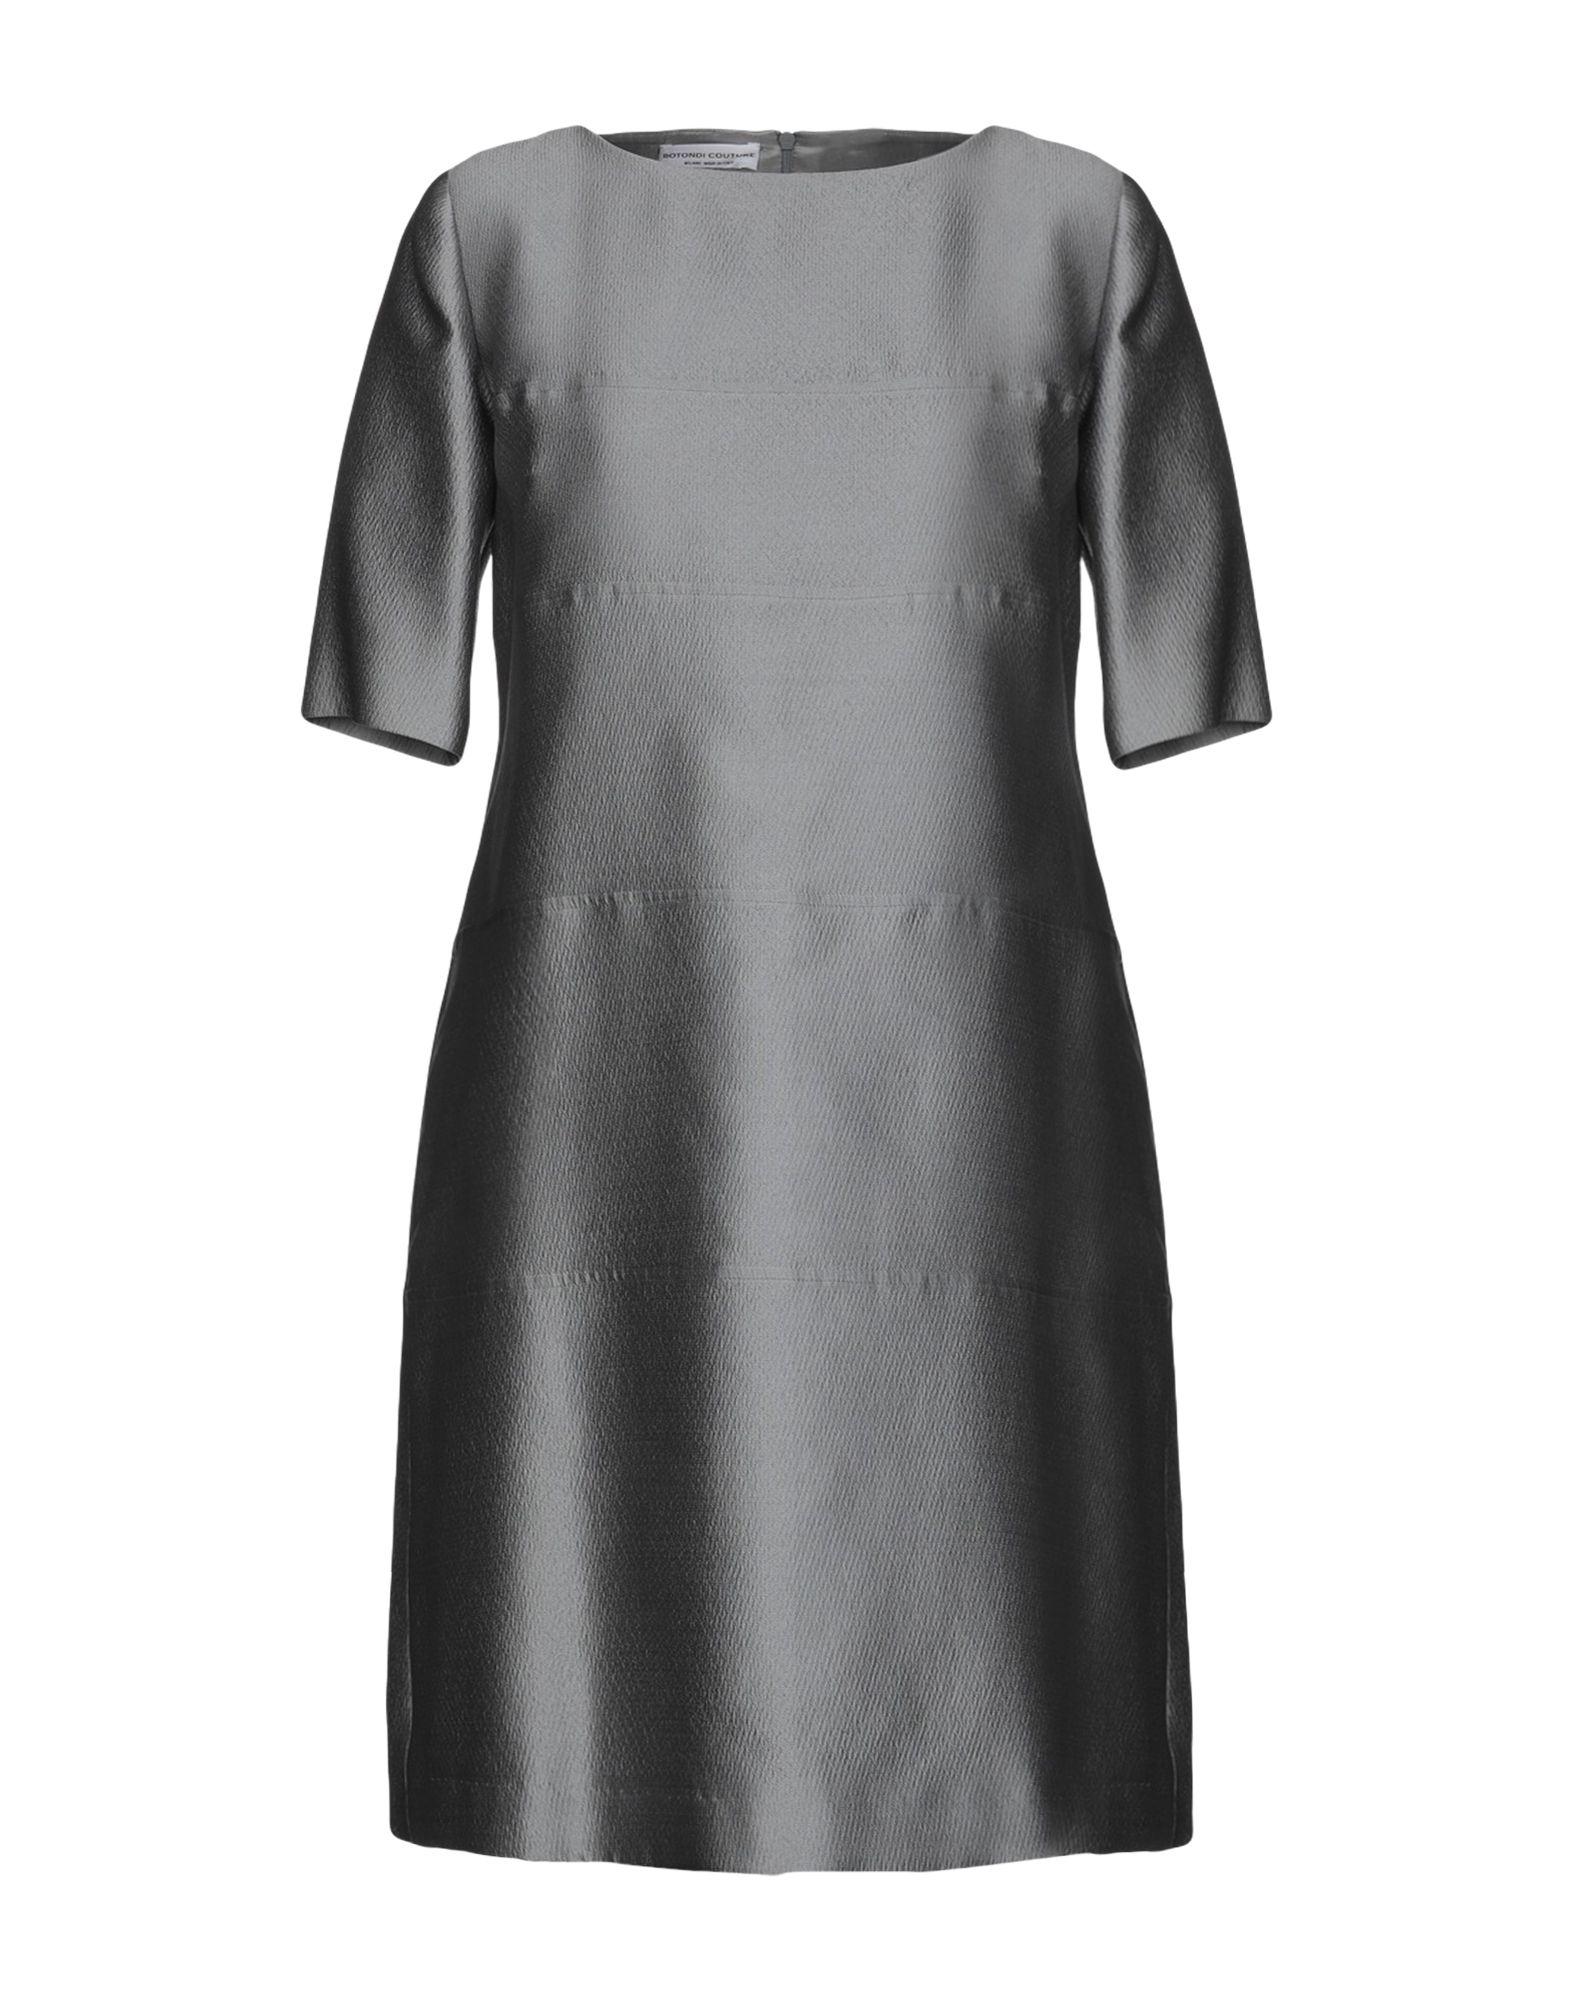 Dress Women Couture Botondi Length Knee 0qSx1wYt